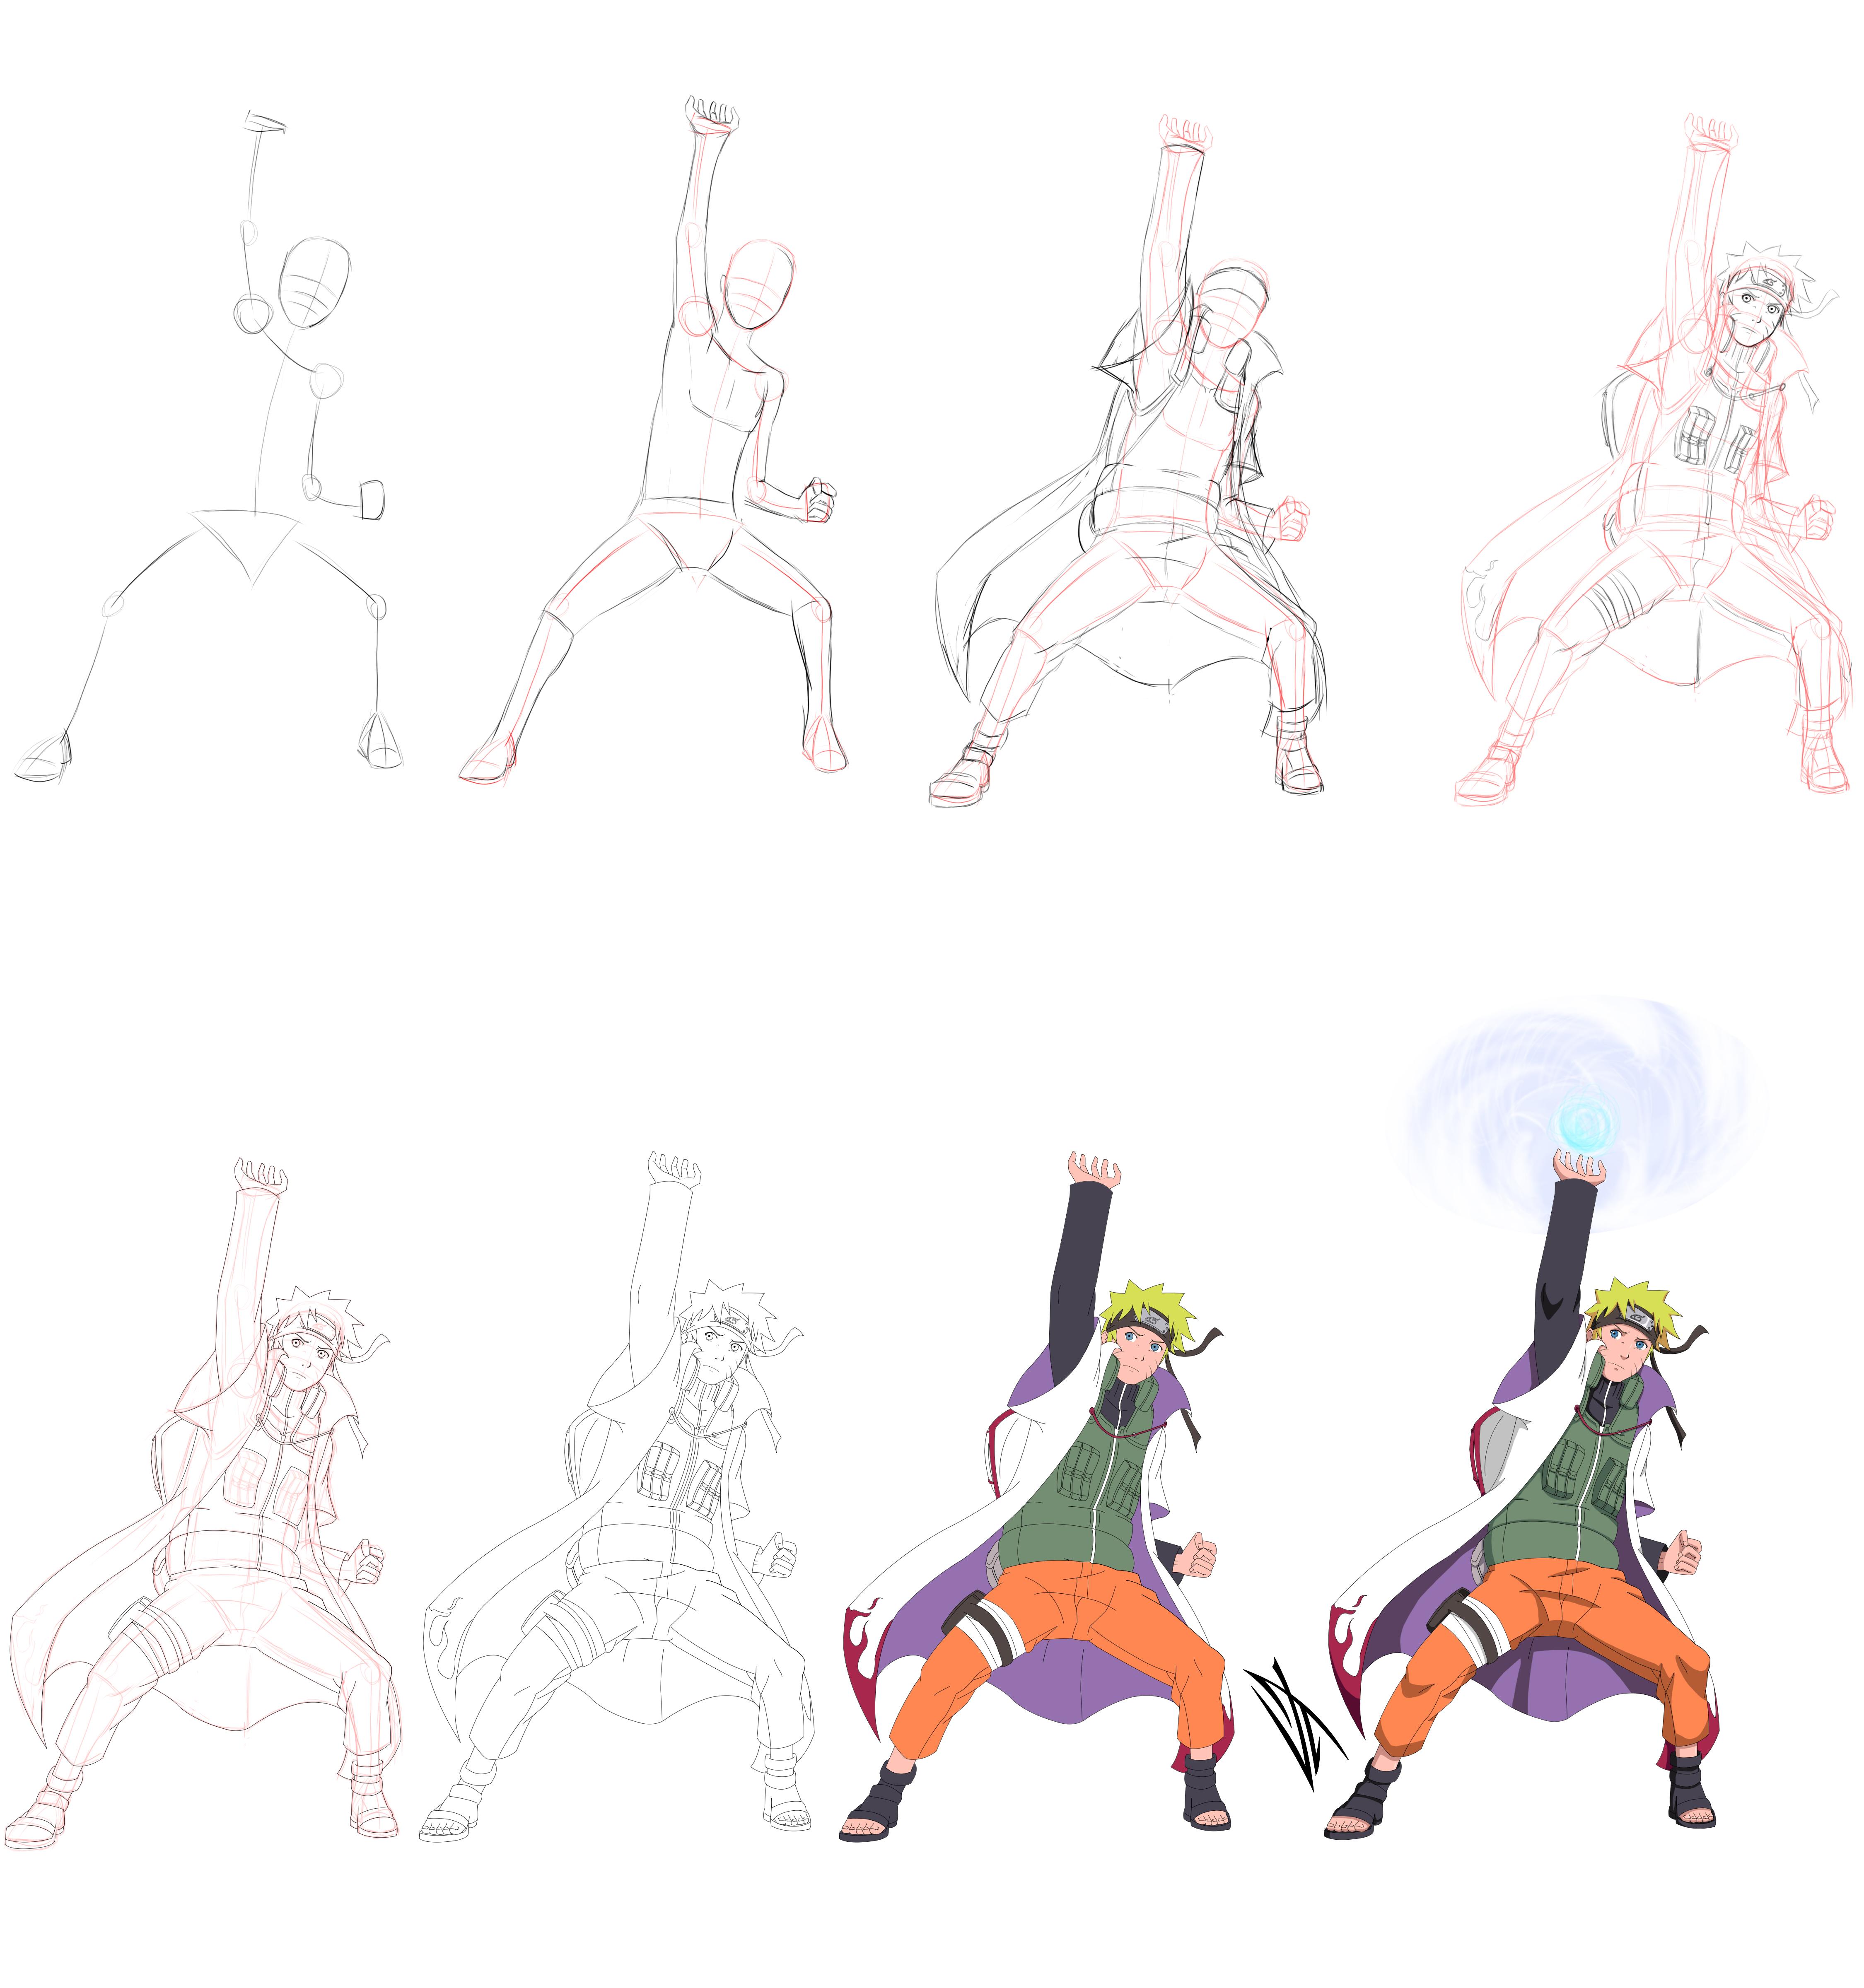 Step by Step Kage Naruto Uzumaki by JohnnyWolf on DeviantArt